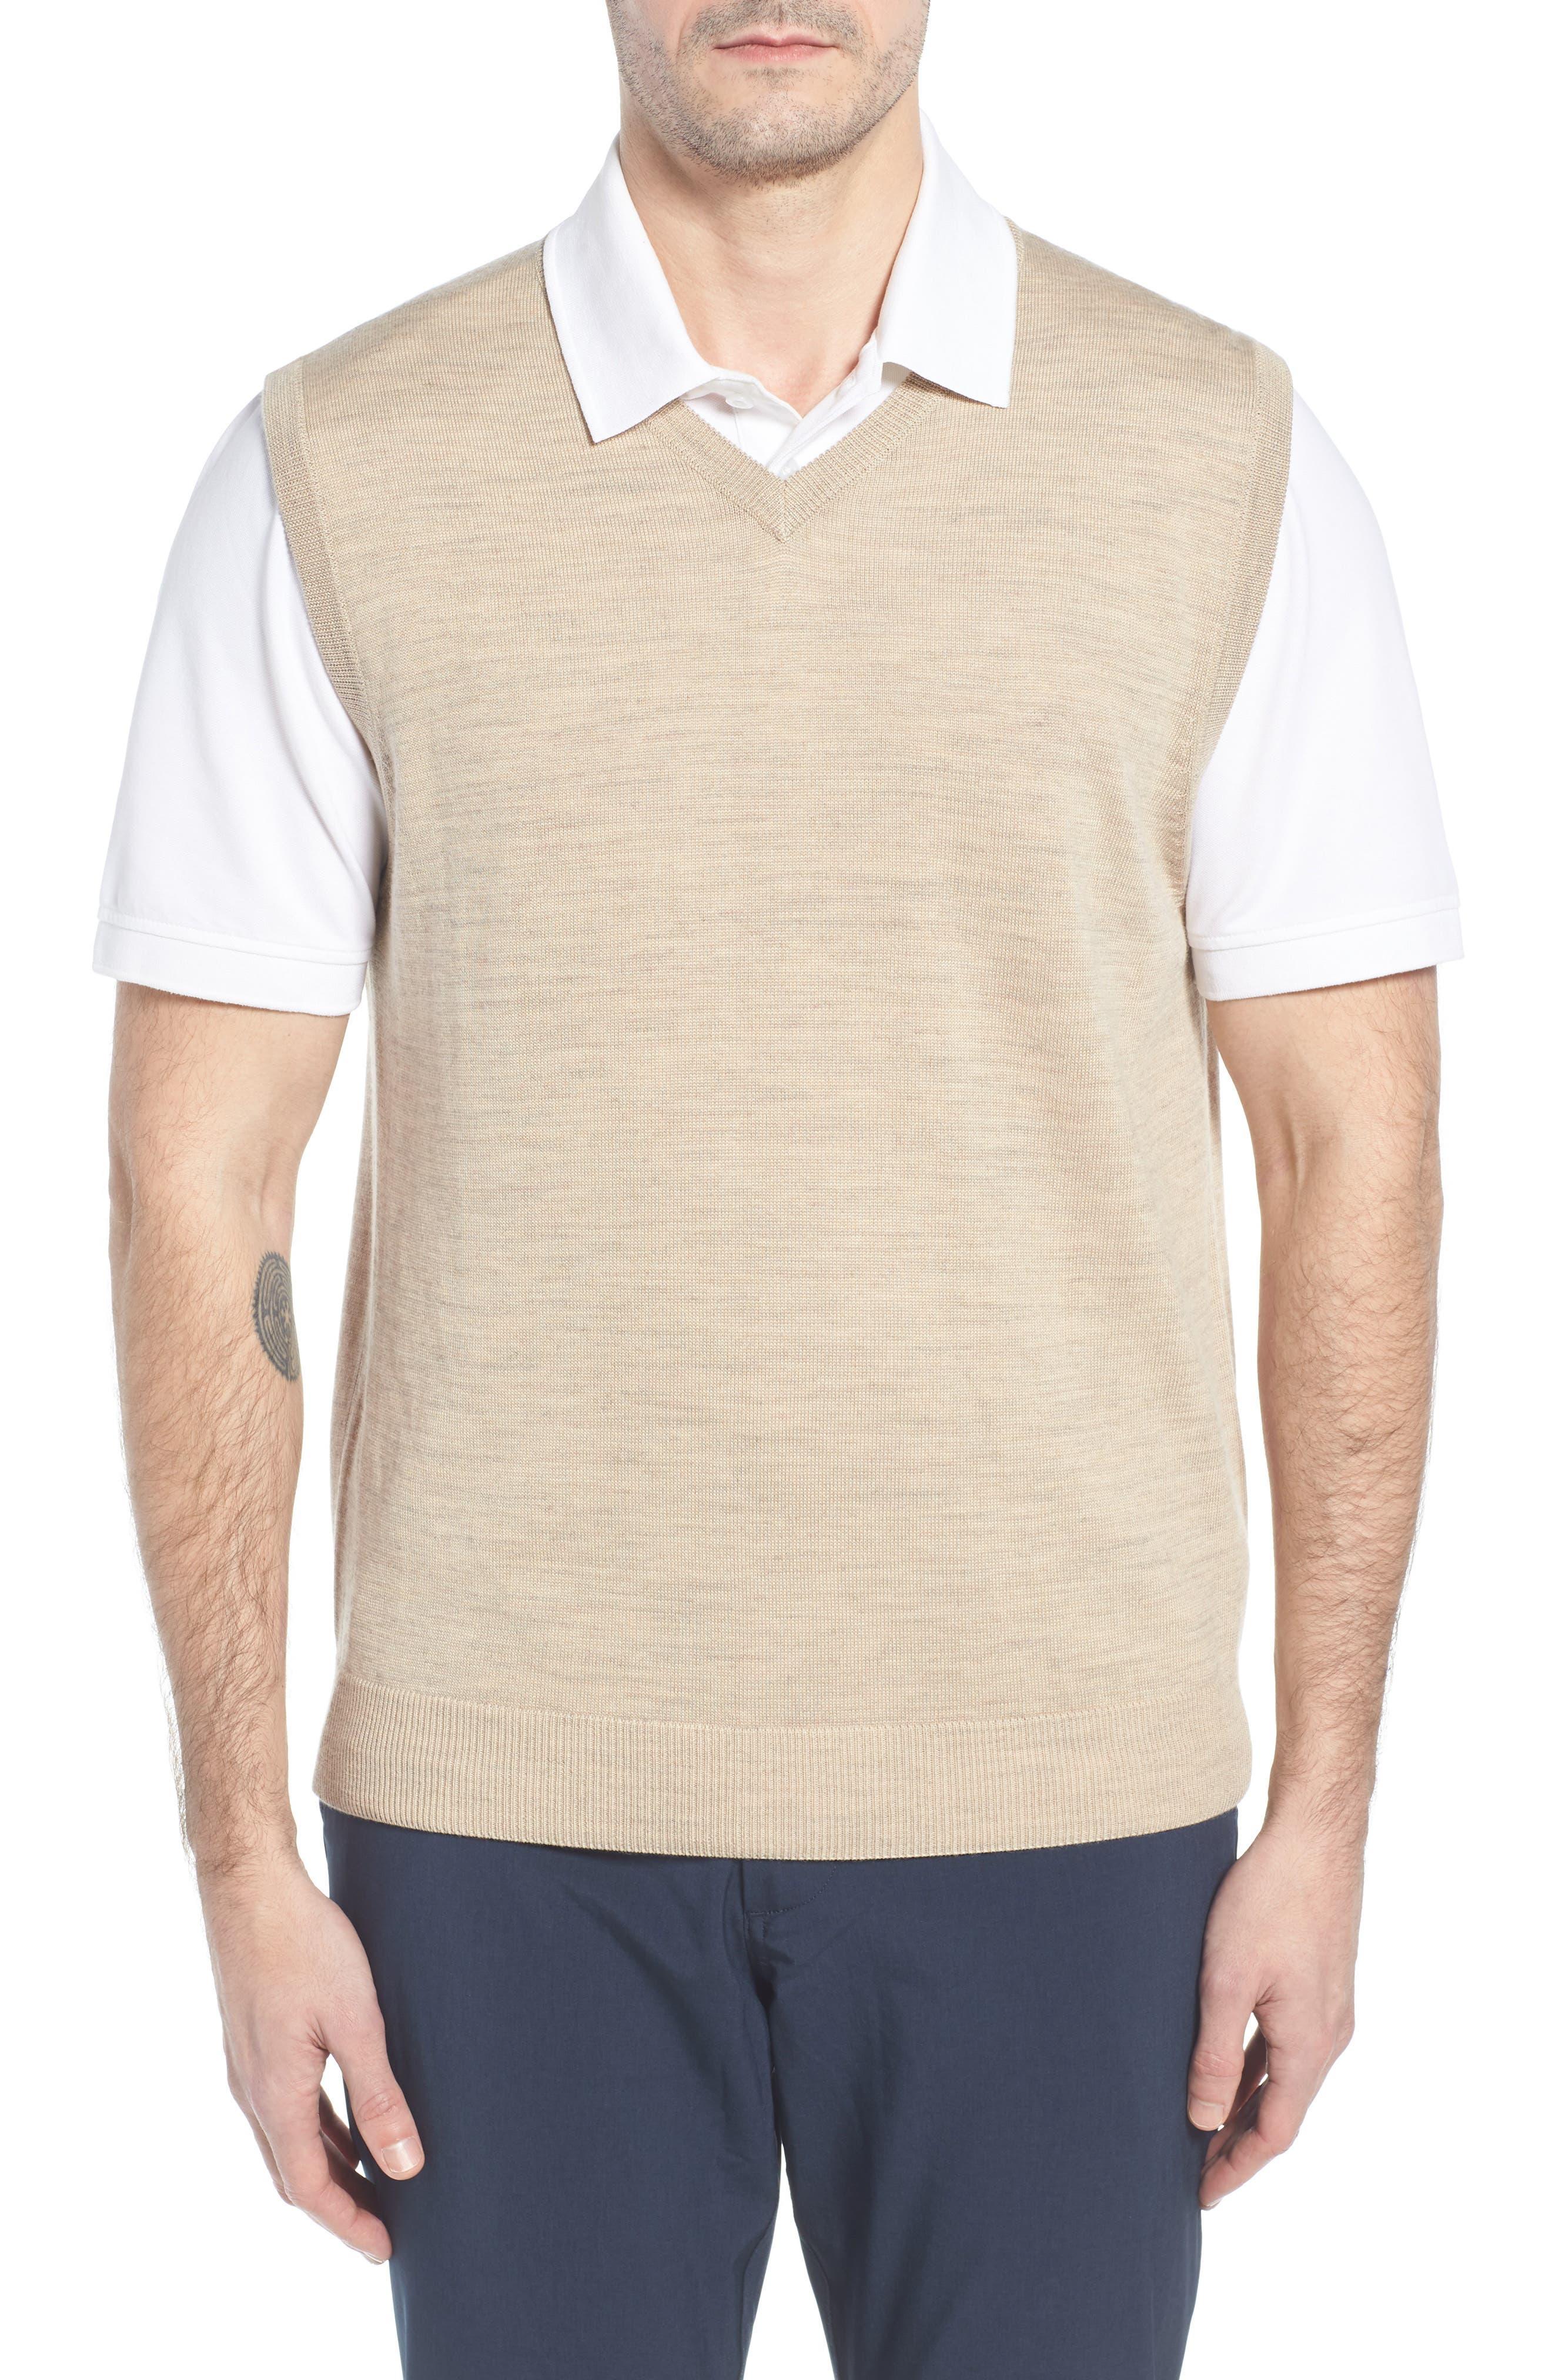 Douglas Merino Wool Blend V-Neck Vest,                             Main thumbnail 1, color,                             Sand Heather